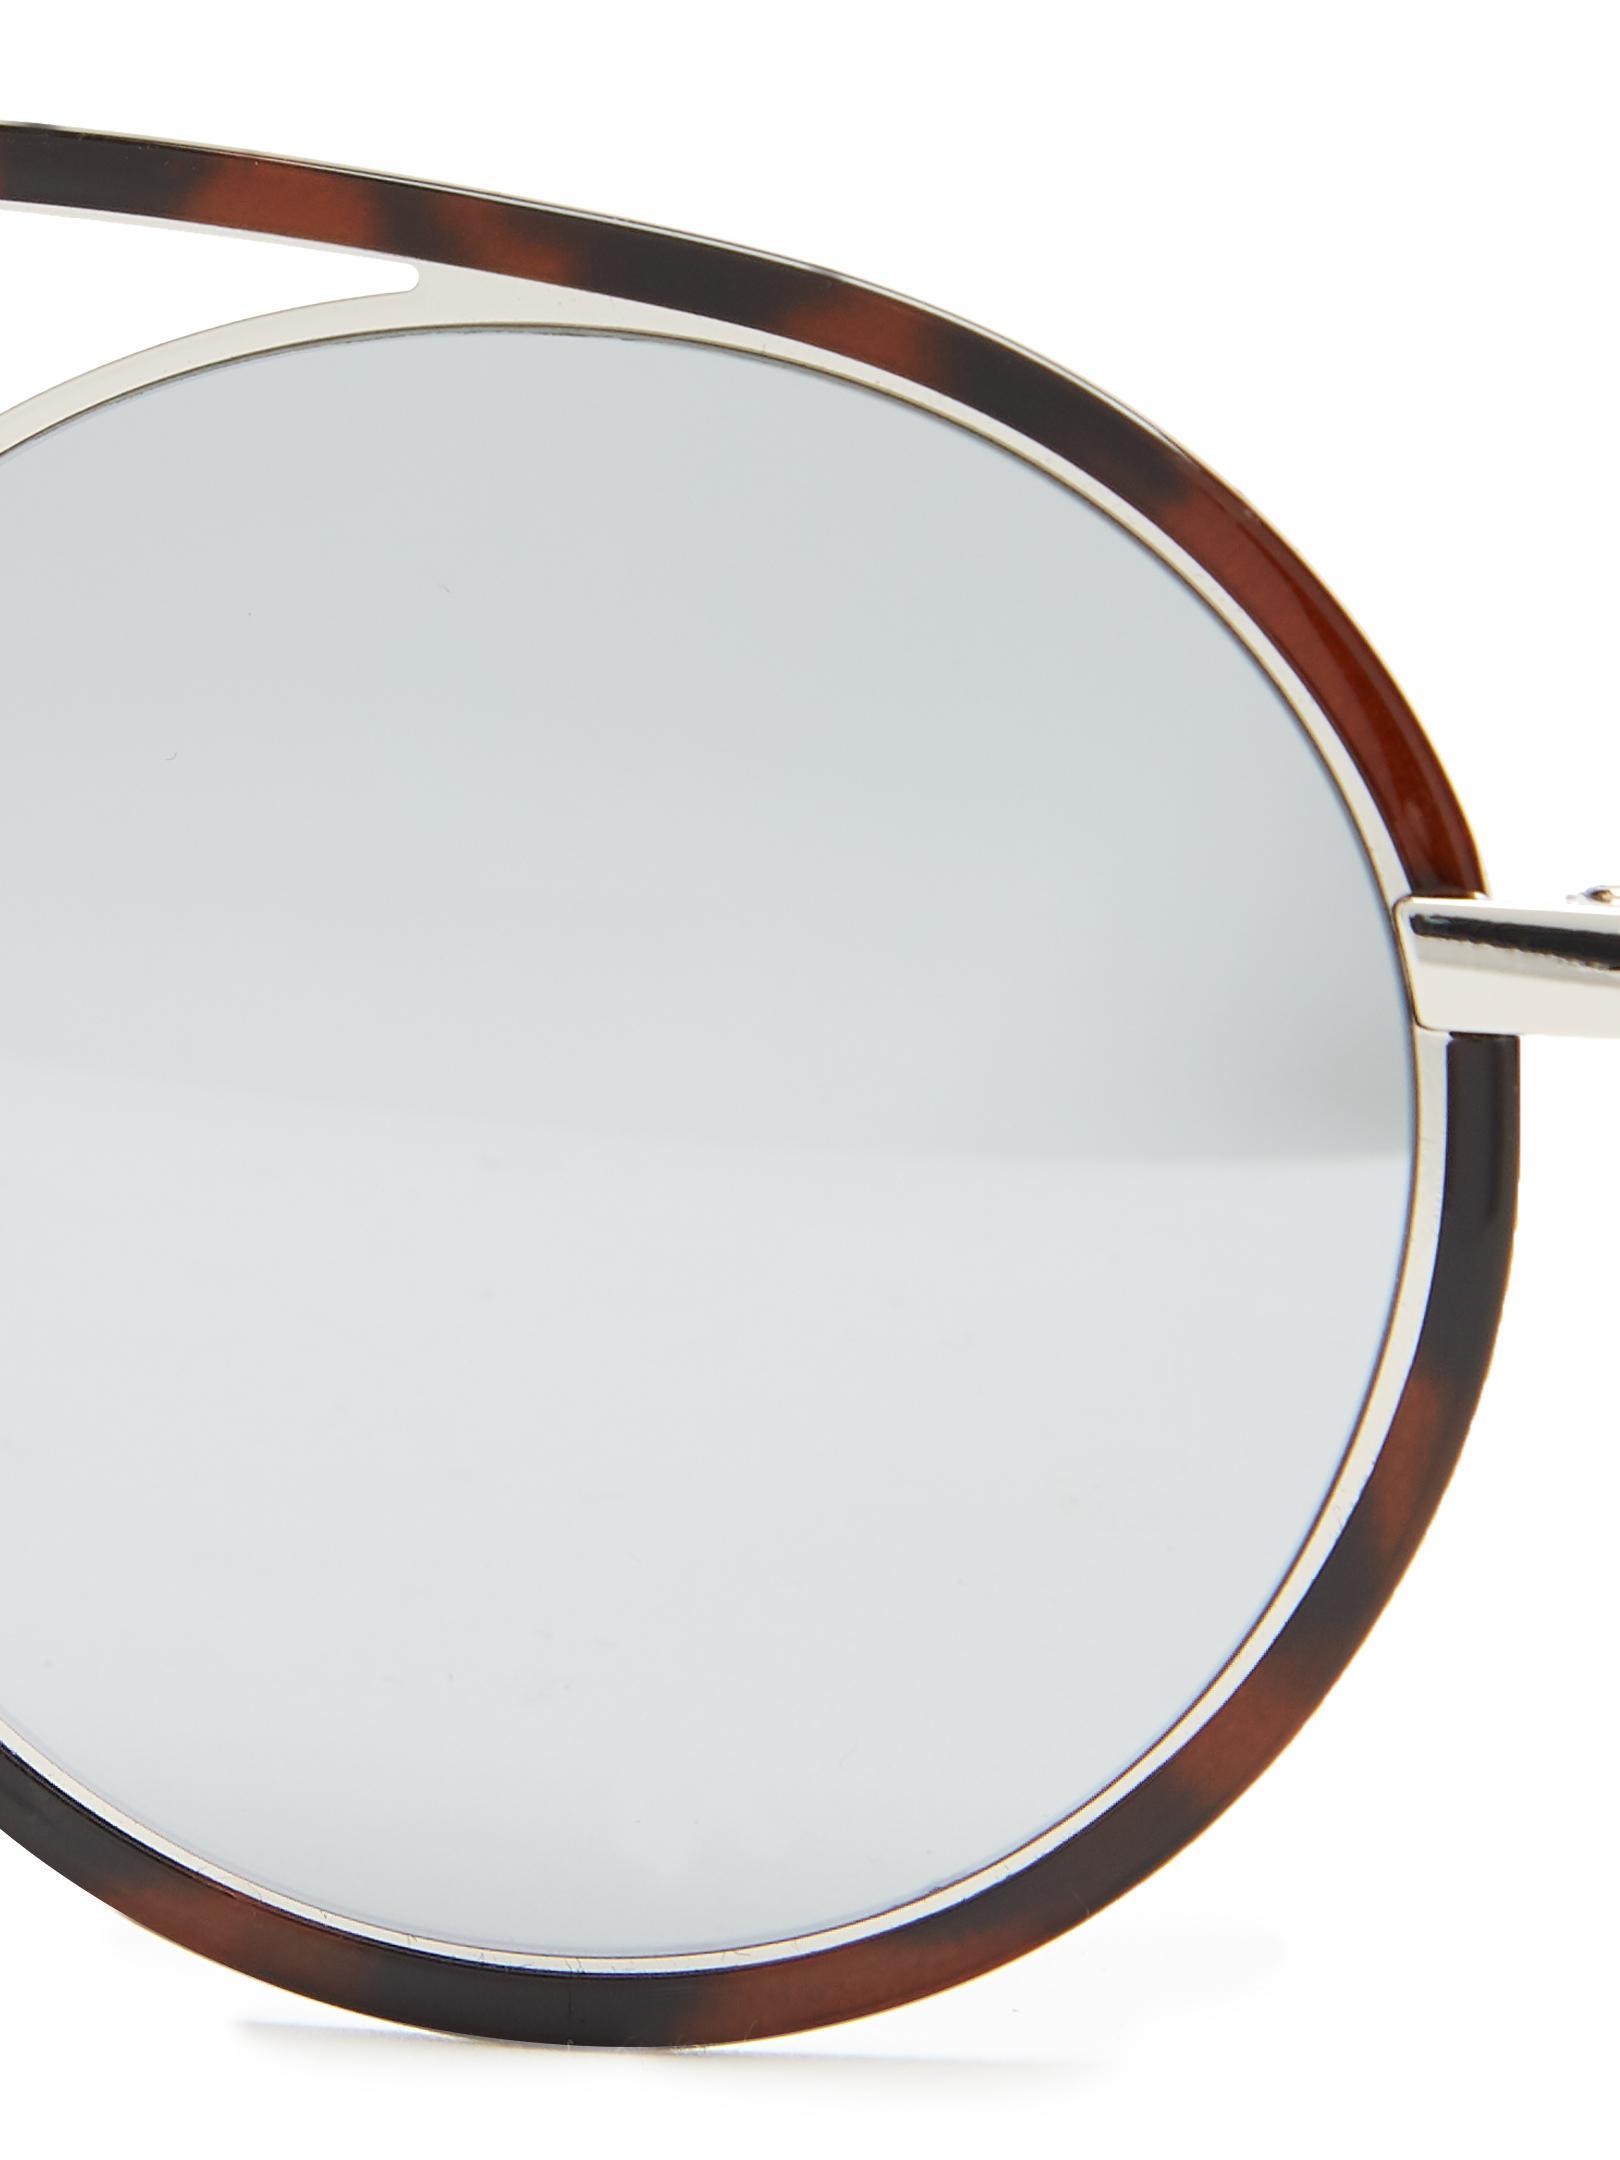 60592f6e07f42 Gallery. Previously sold at  MATCHESFASHION.COM · Men s Mirrored Sunglasses